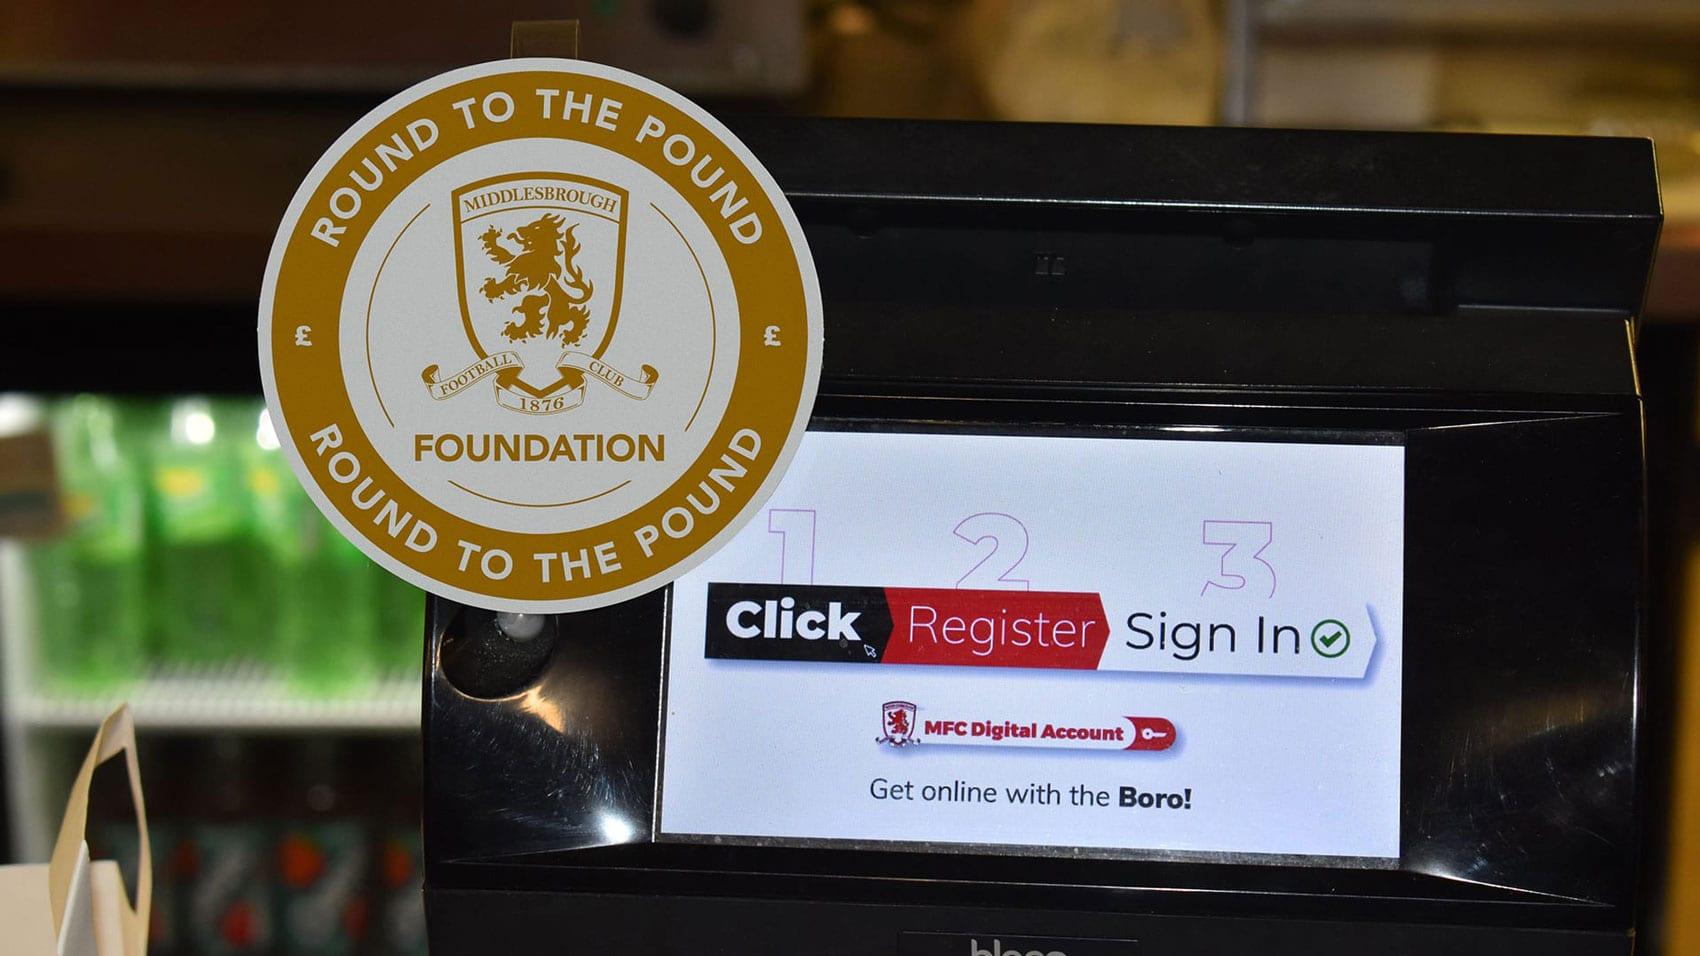 Round to the pound logo design on MFC Foundation, Middlesbrough Football Club Store, MFC Store tills checkout  - Riverside Stadium #boro #uptheboro